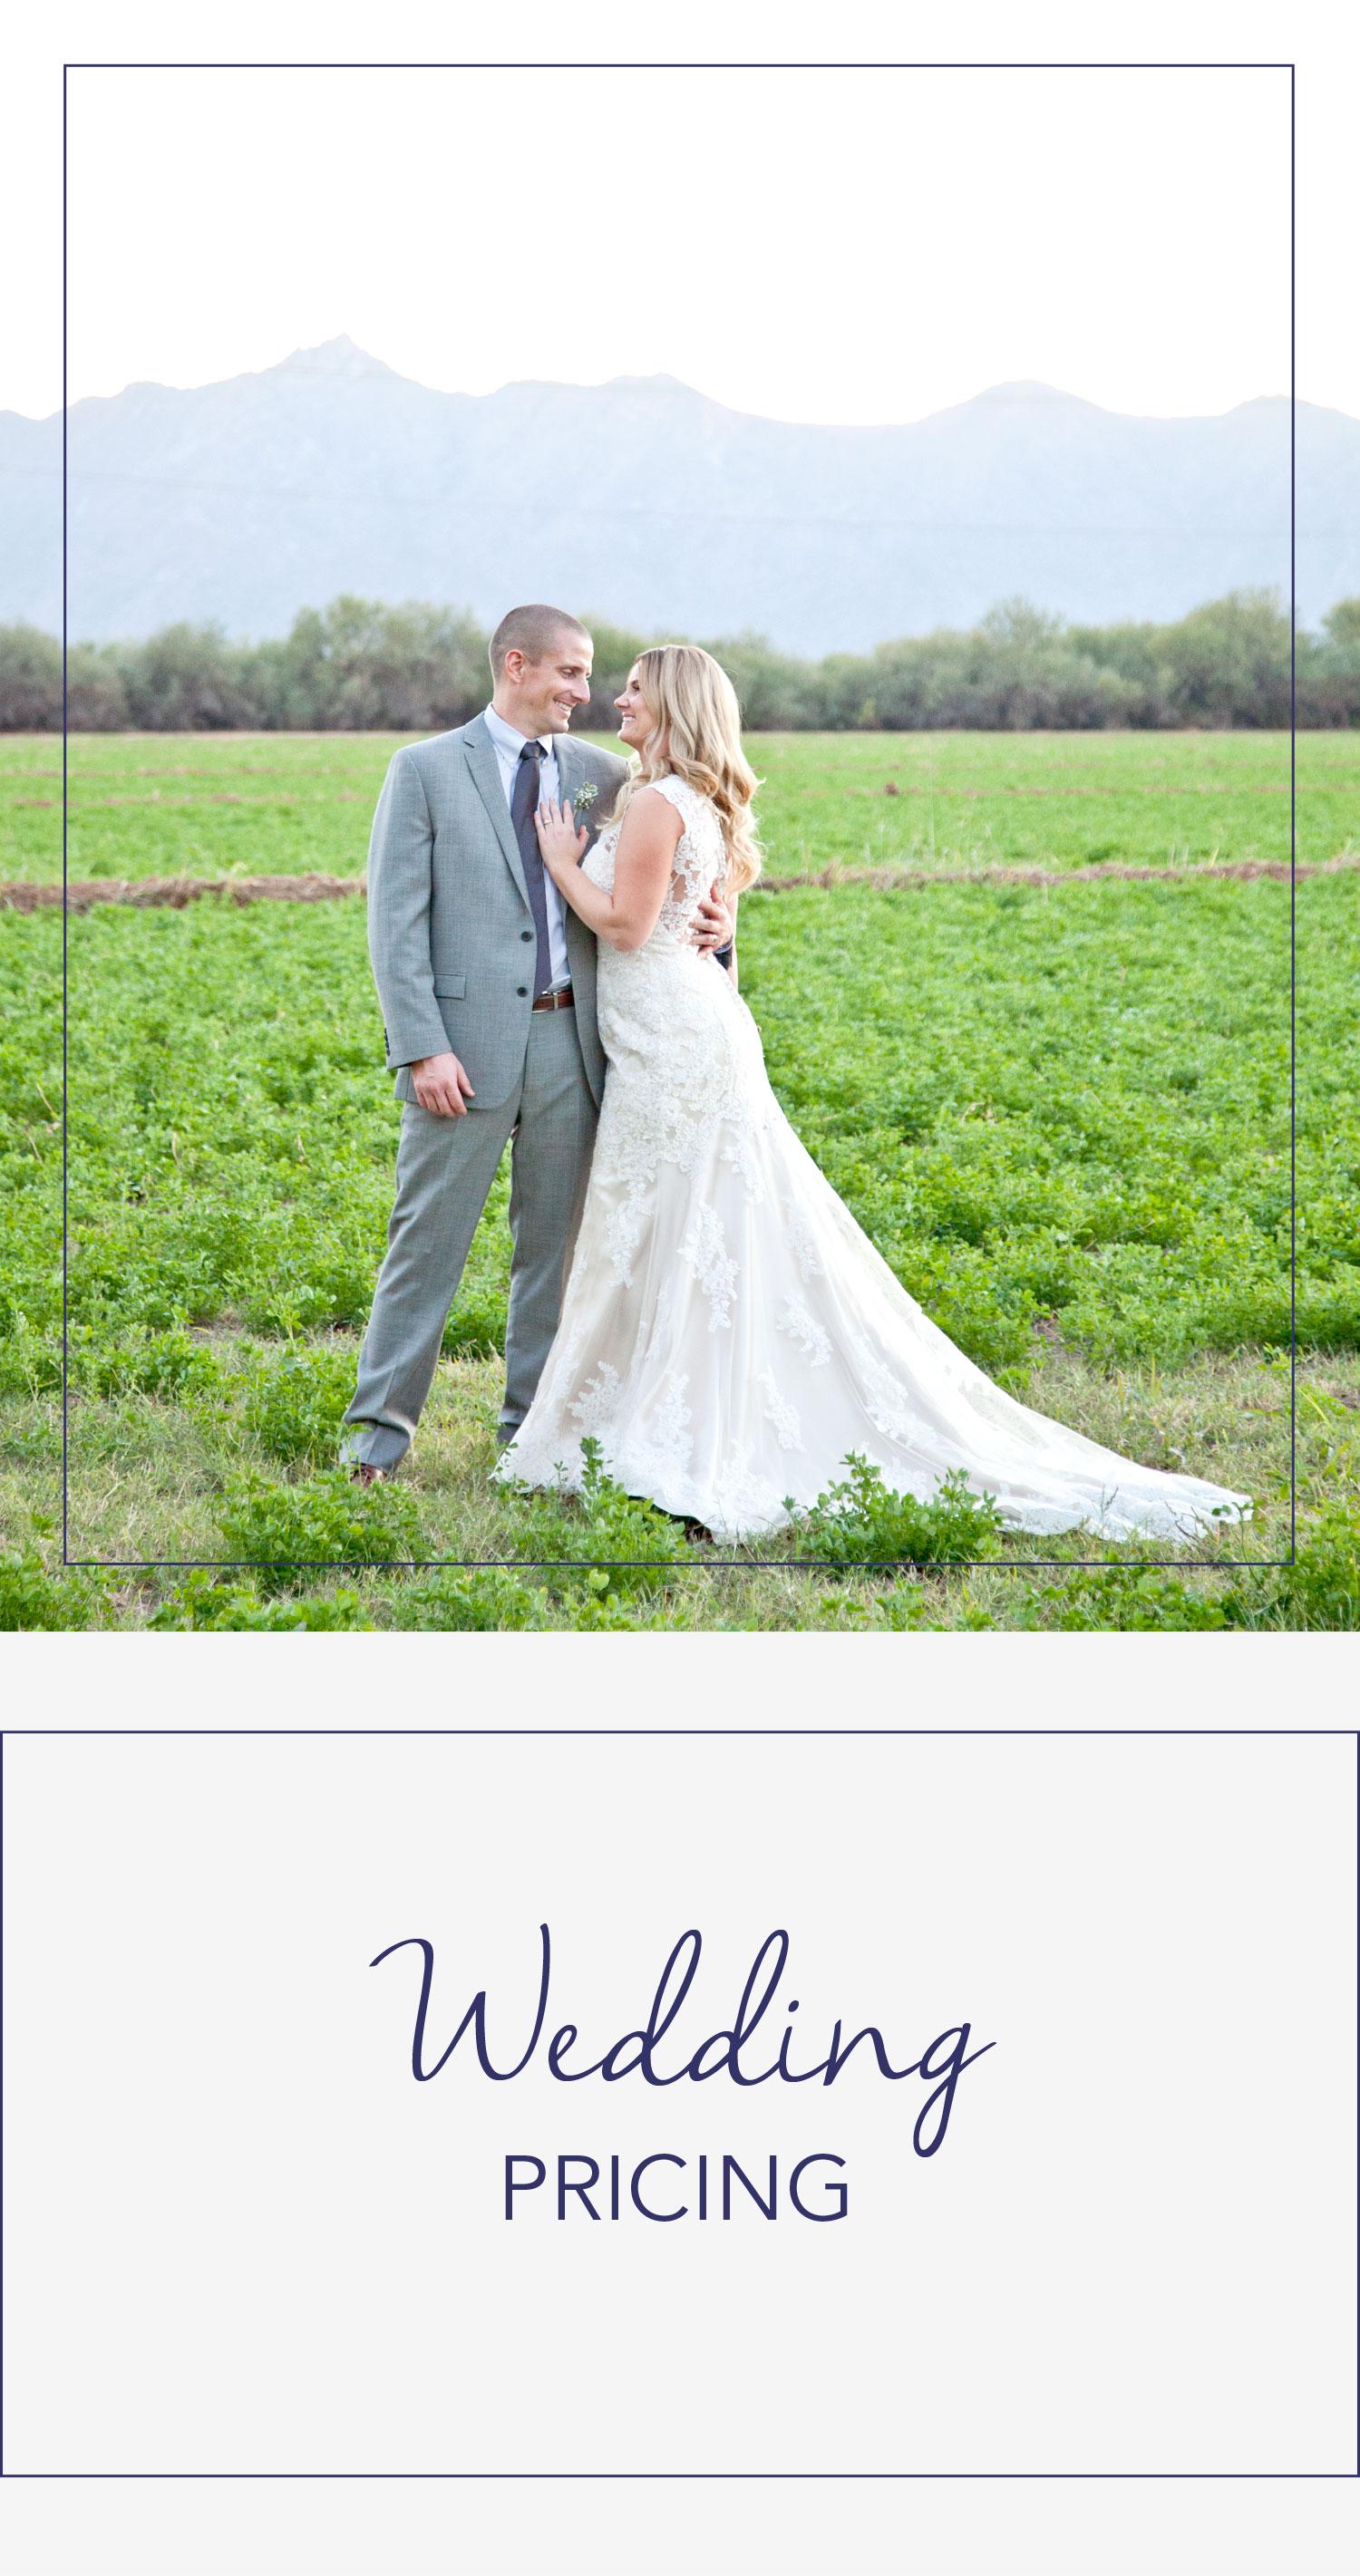 Teresa-Valencia-Photography-Wedding-Pricing.jpg